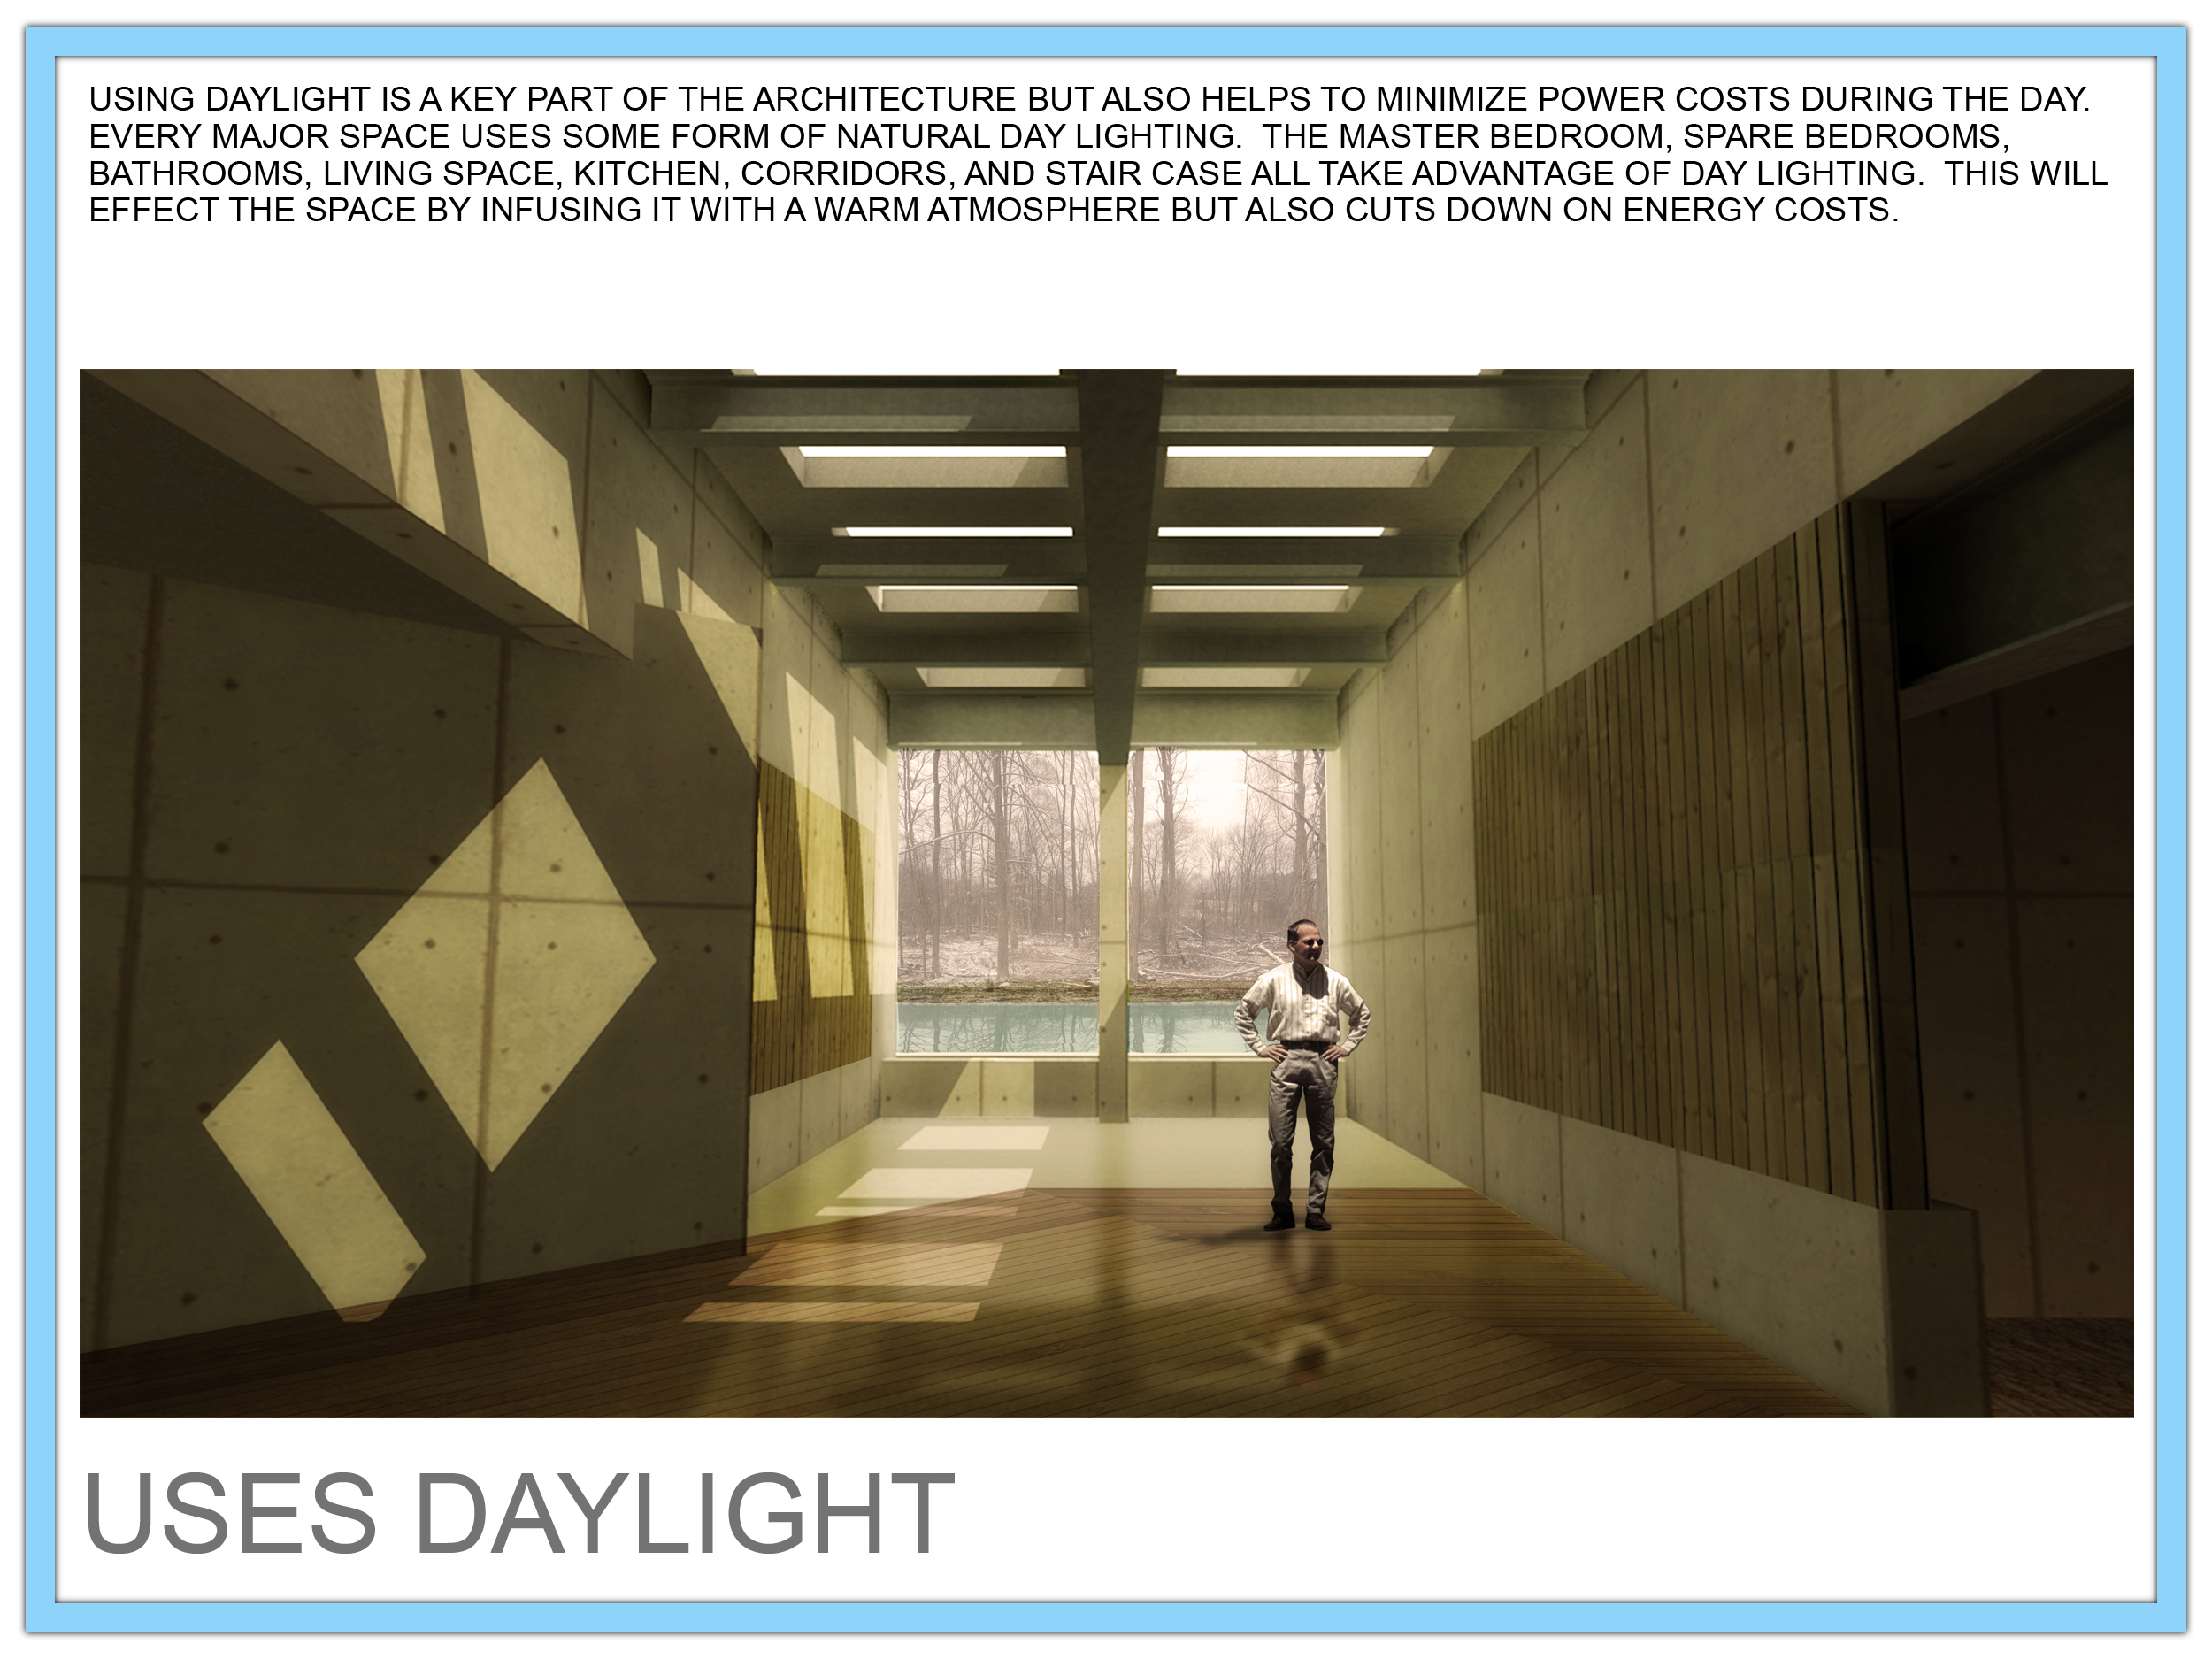 UsesDaylight.jpg